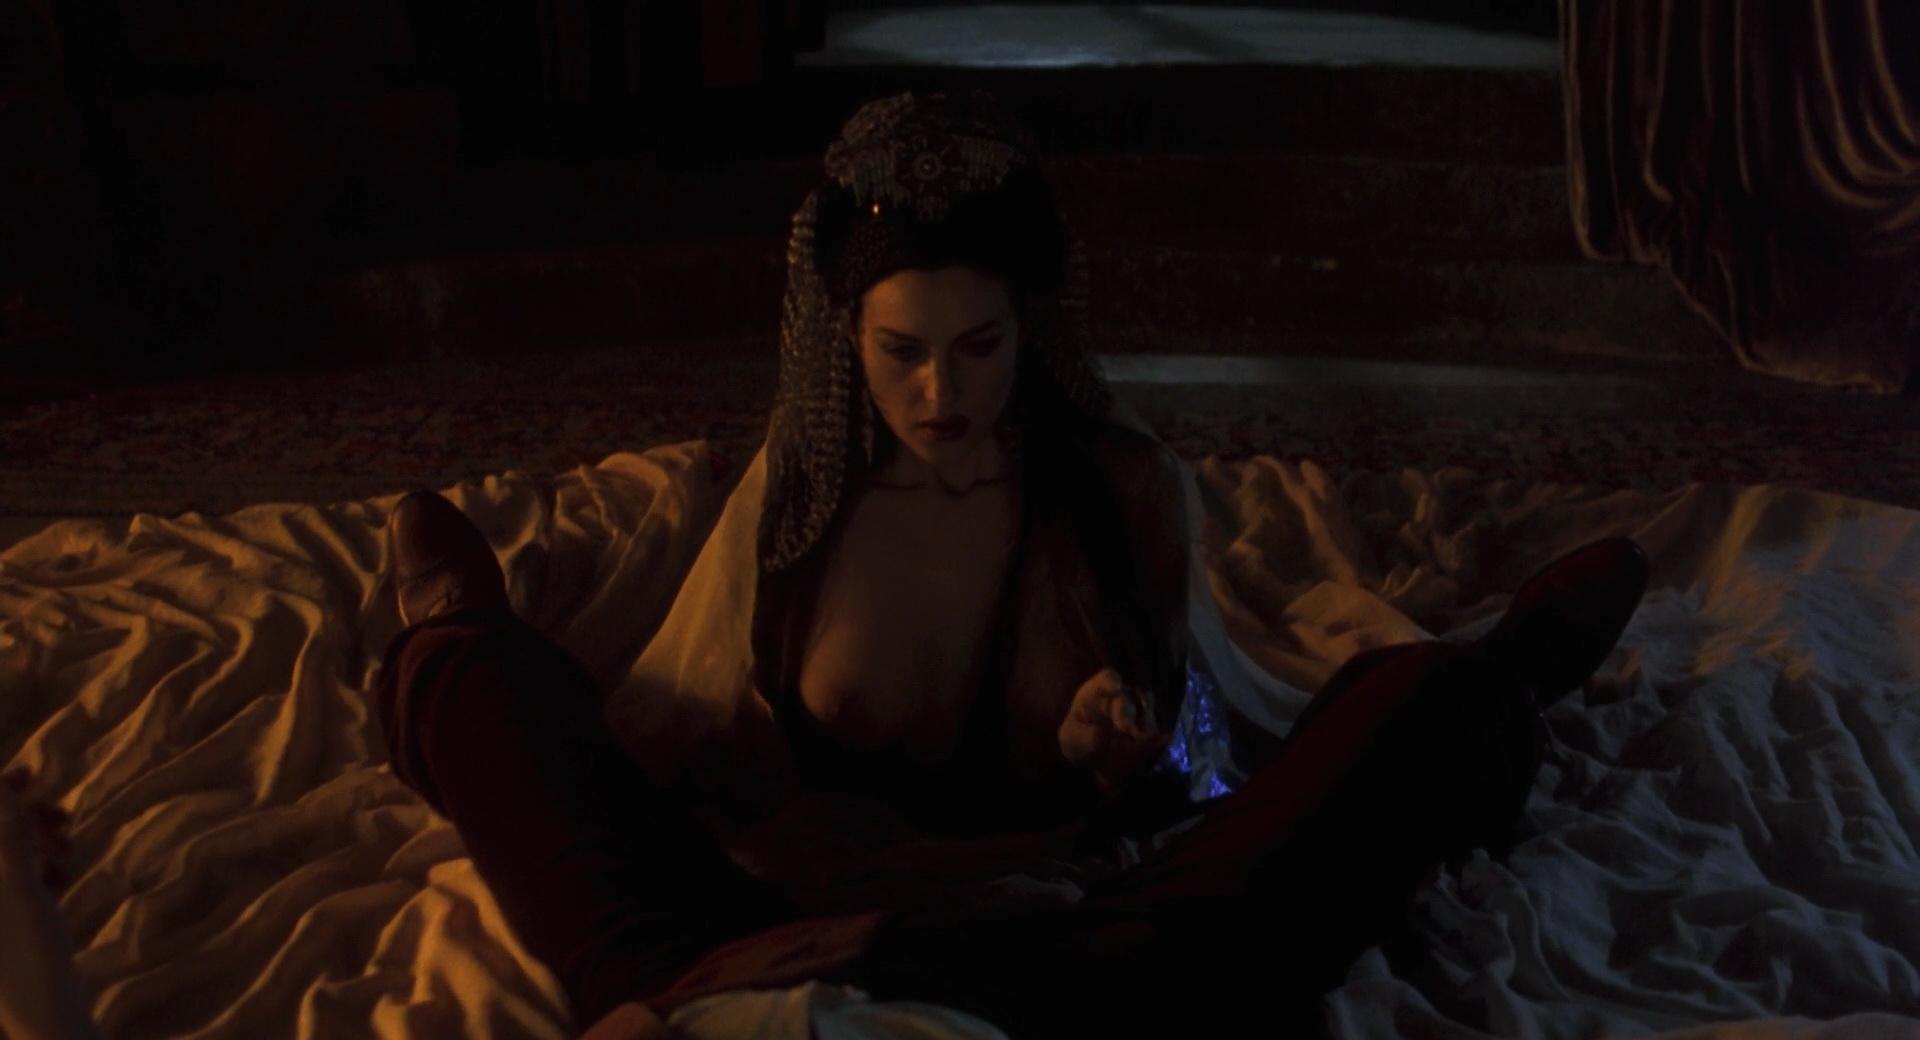 Bram stokers dracula nude